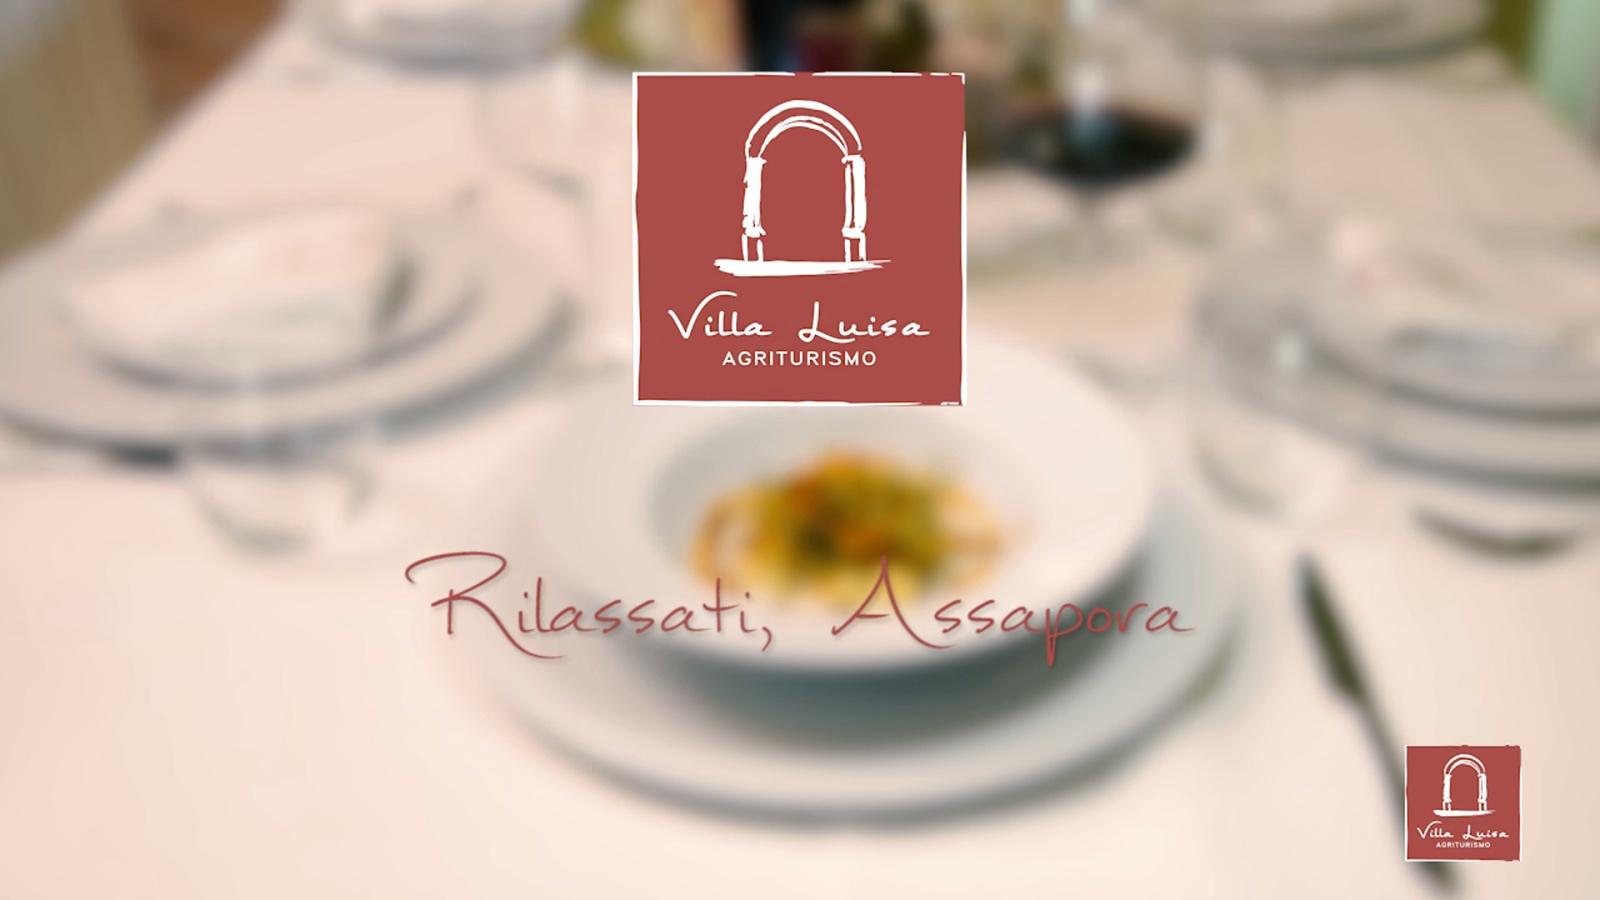 Commercial - Rilassati Assapora, Villa Luisa